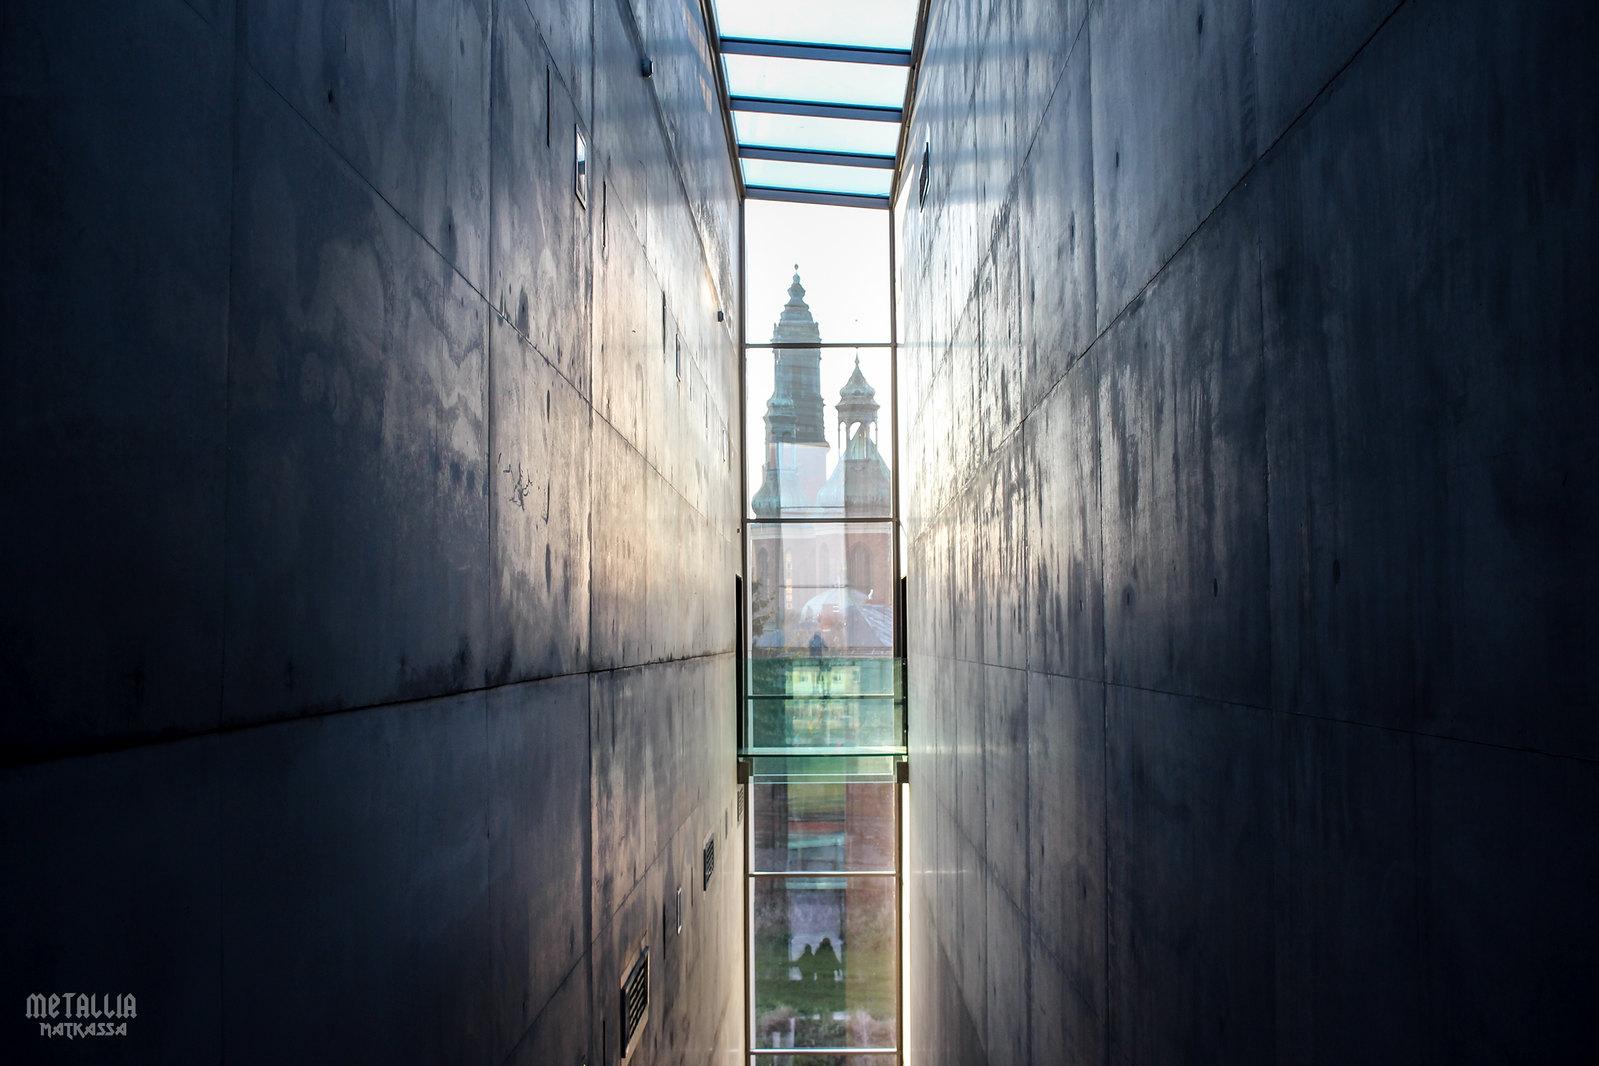 poznan, visit poznan, brama poznania ichot, poznanin nähtävyydet, cathedral island, katedraalisaari